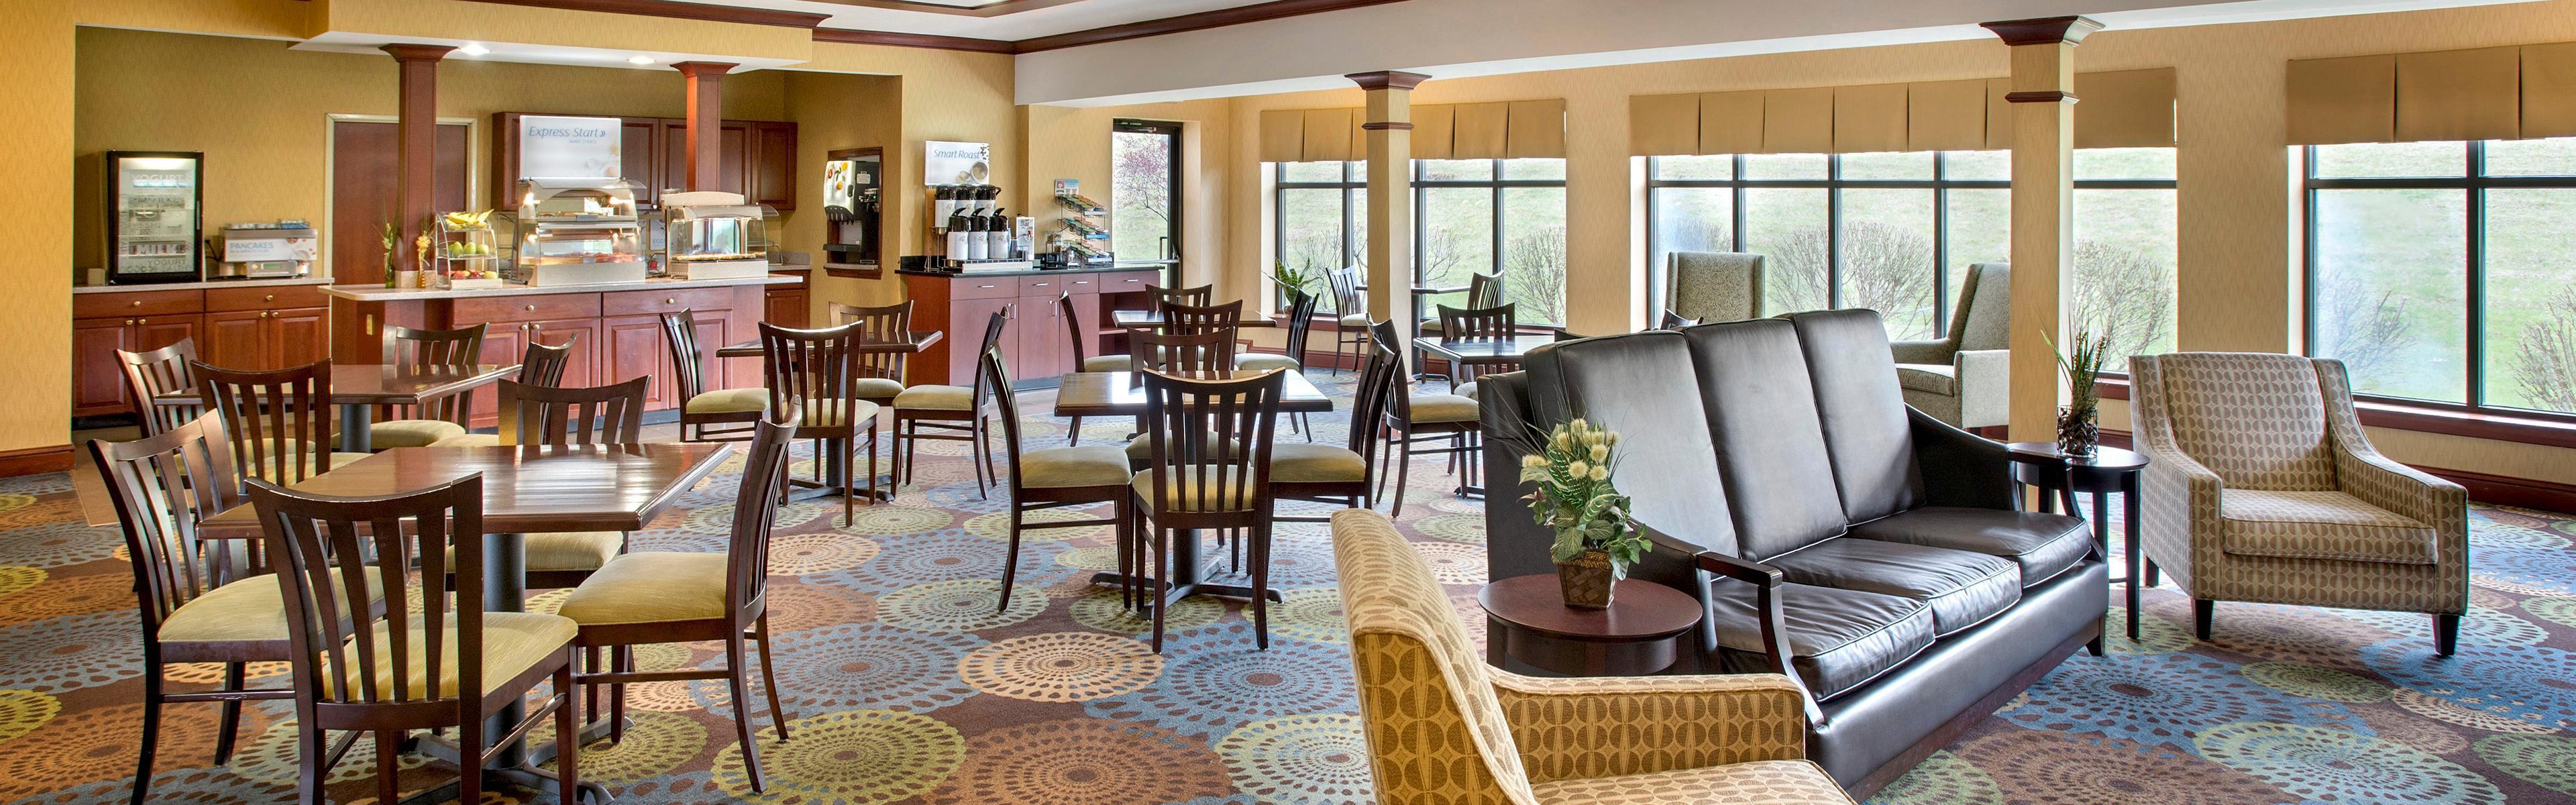 Holiday Inn Express & Suites East Greenbush(Albany-Skyline) image 3